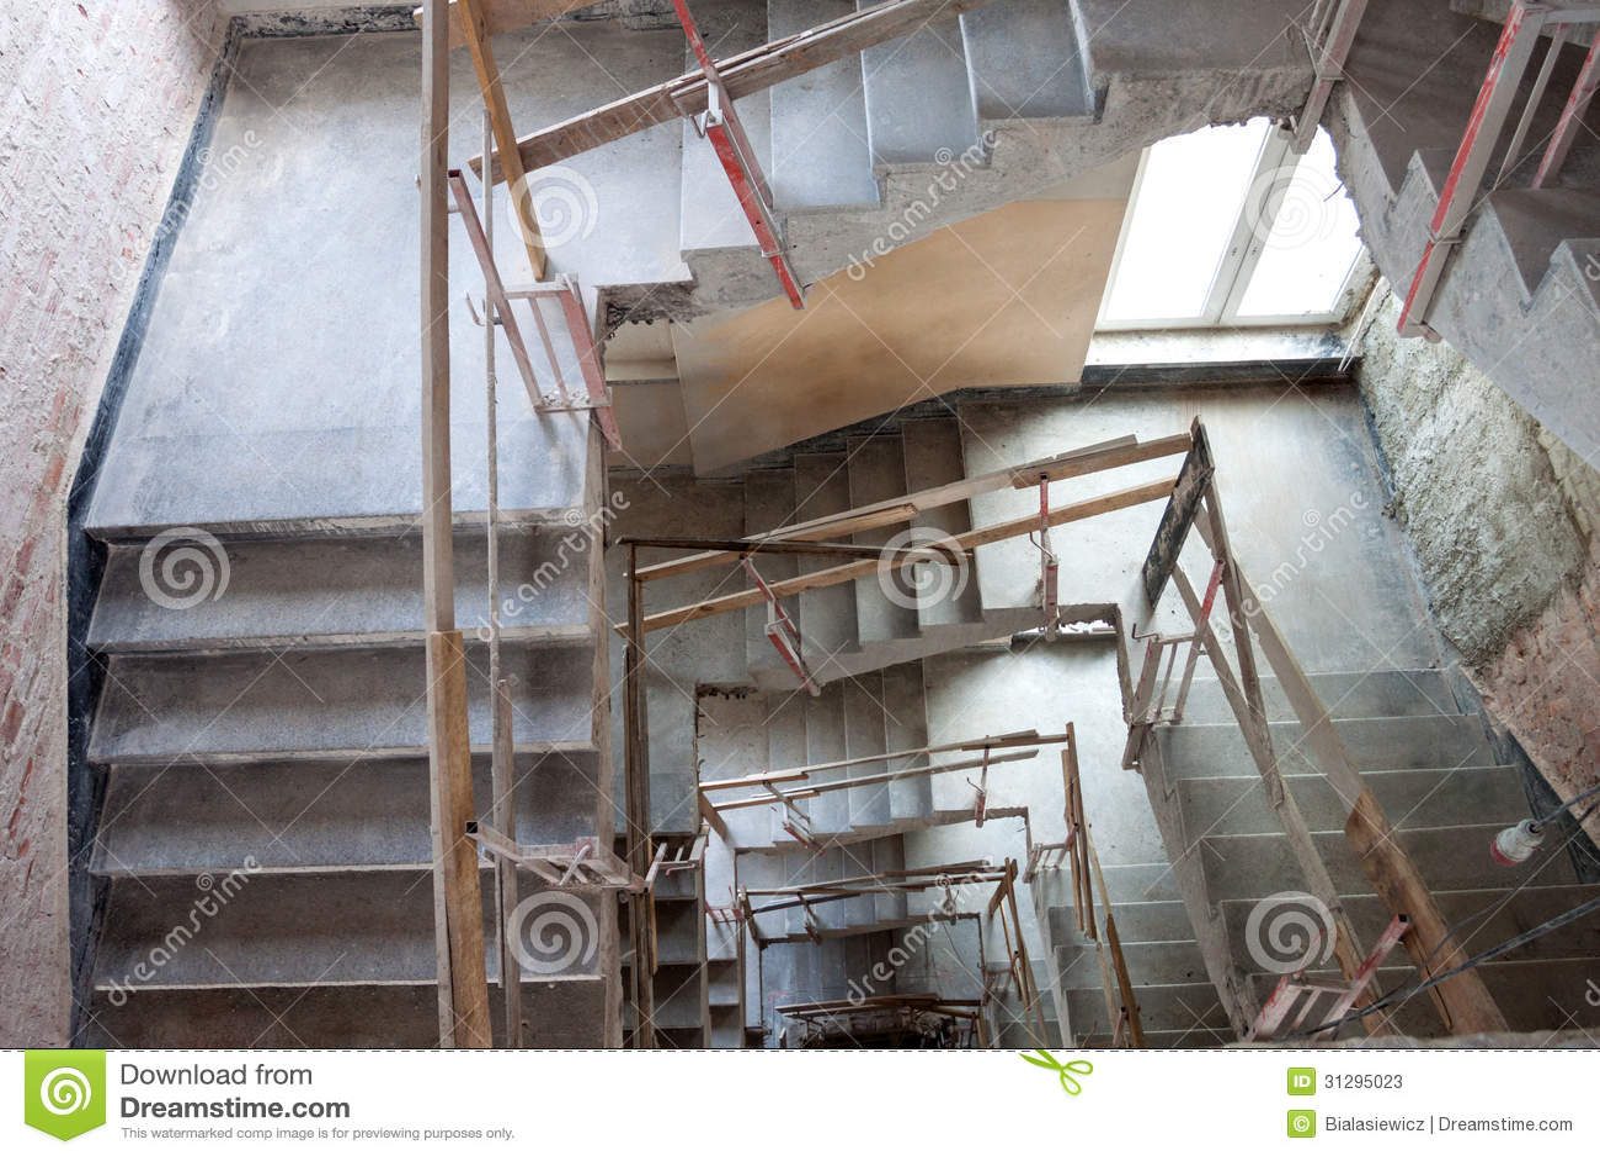 Lift Shaft Construction Stock Image Image Of Banister